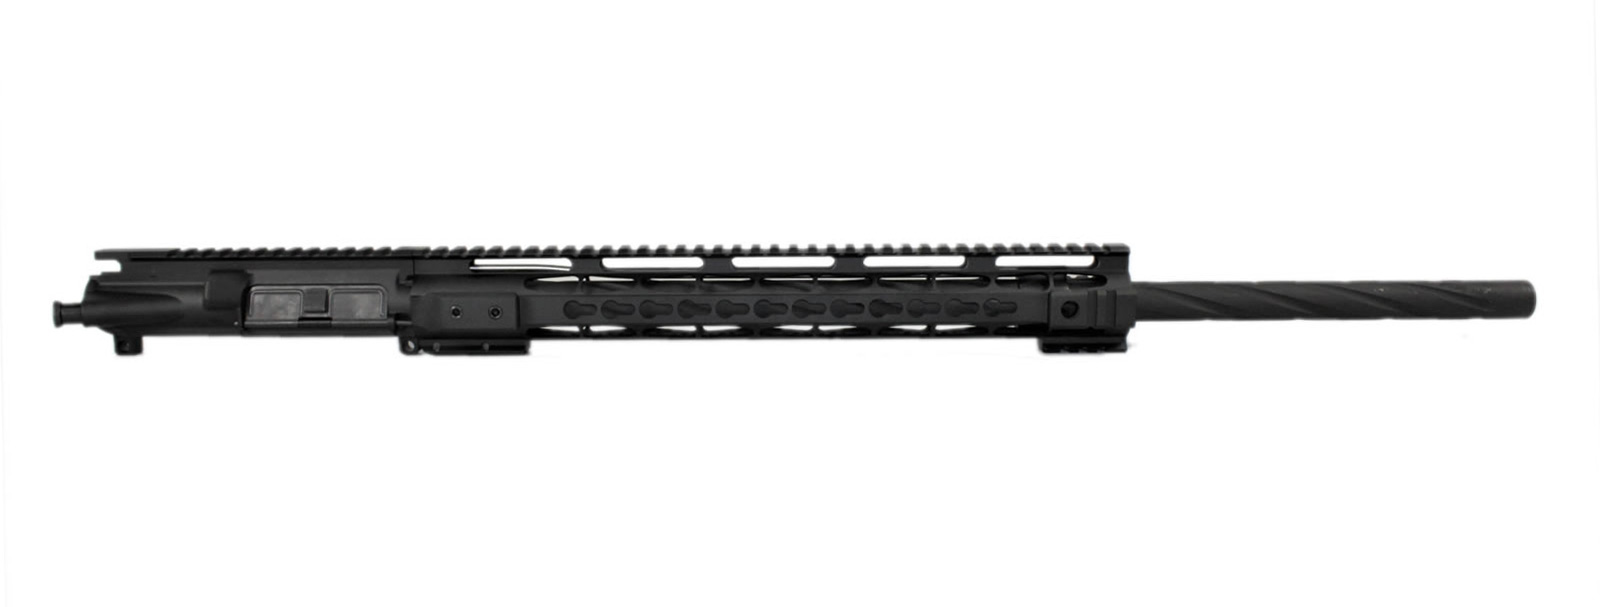 ar15-24-upper-assembly-223-5-56-spiral-flute-15-cbc-arms-rail-keymod-2